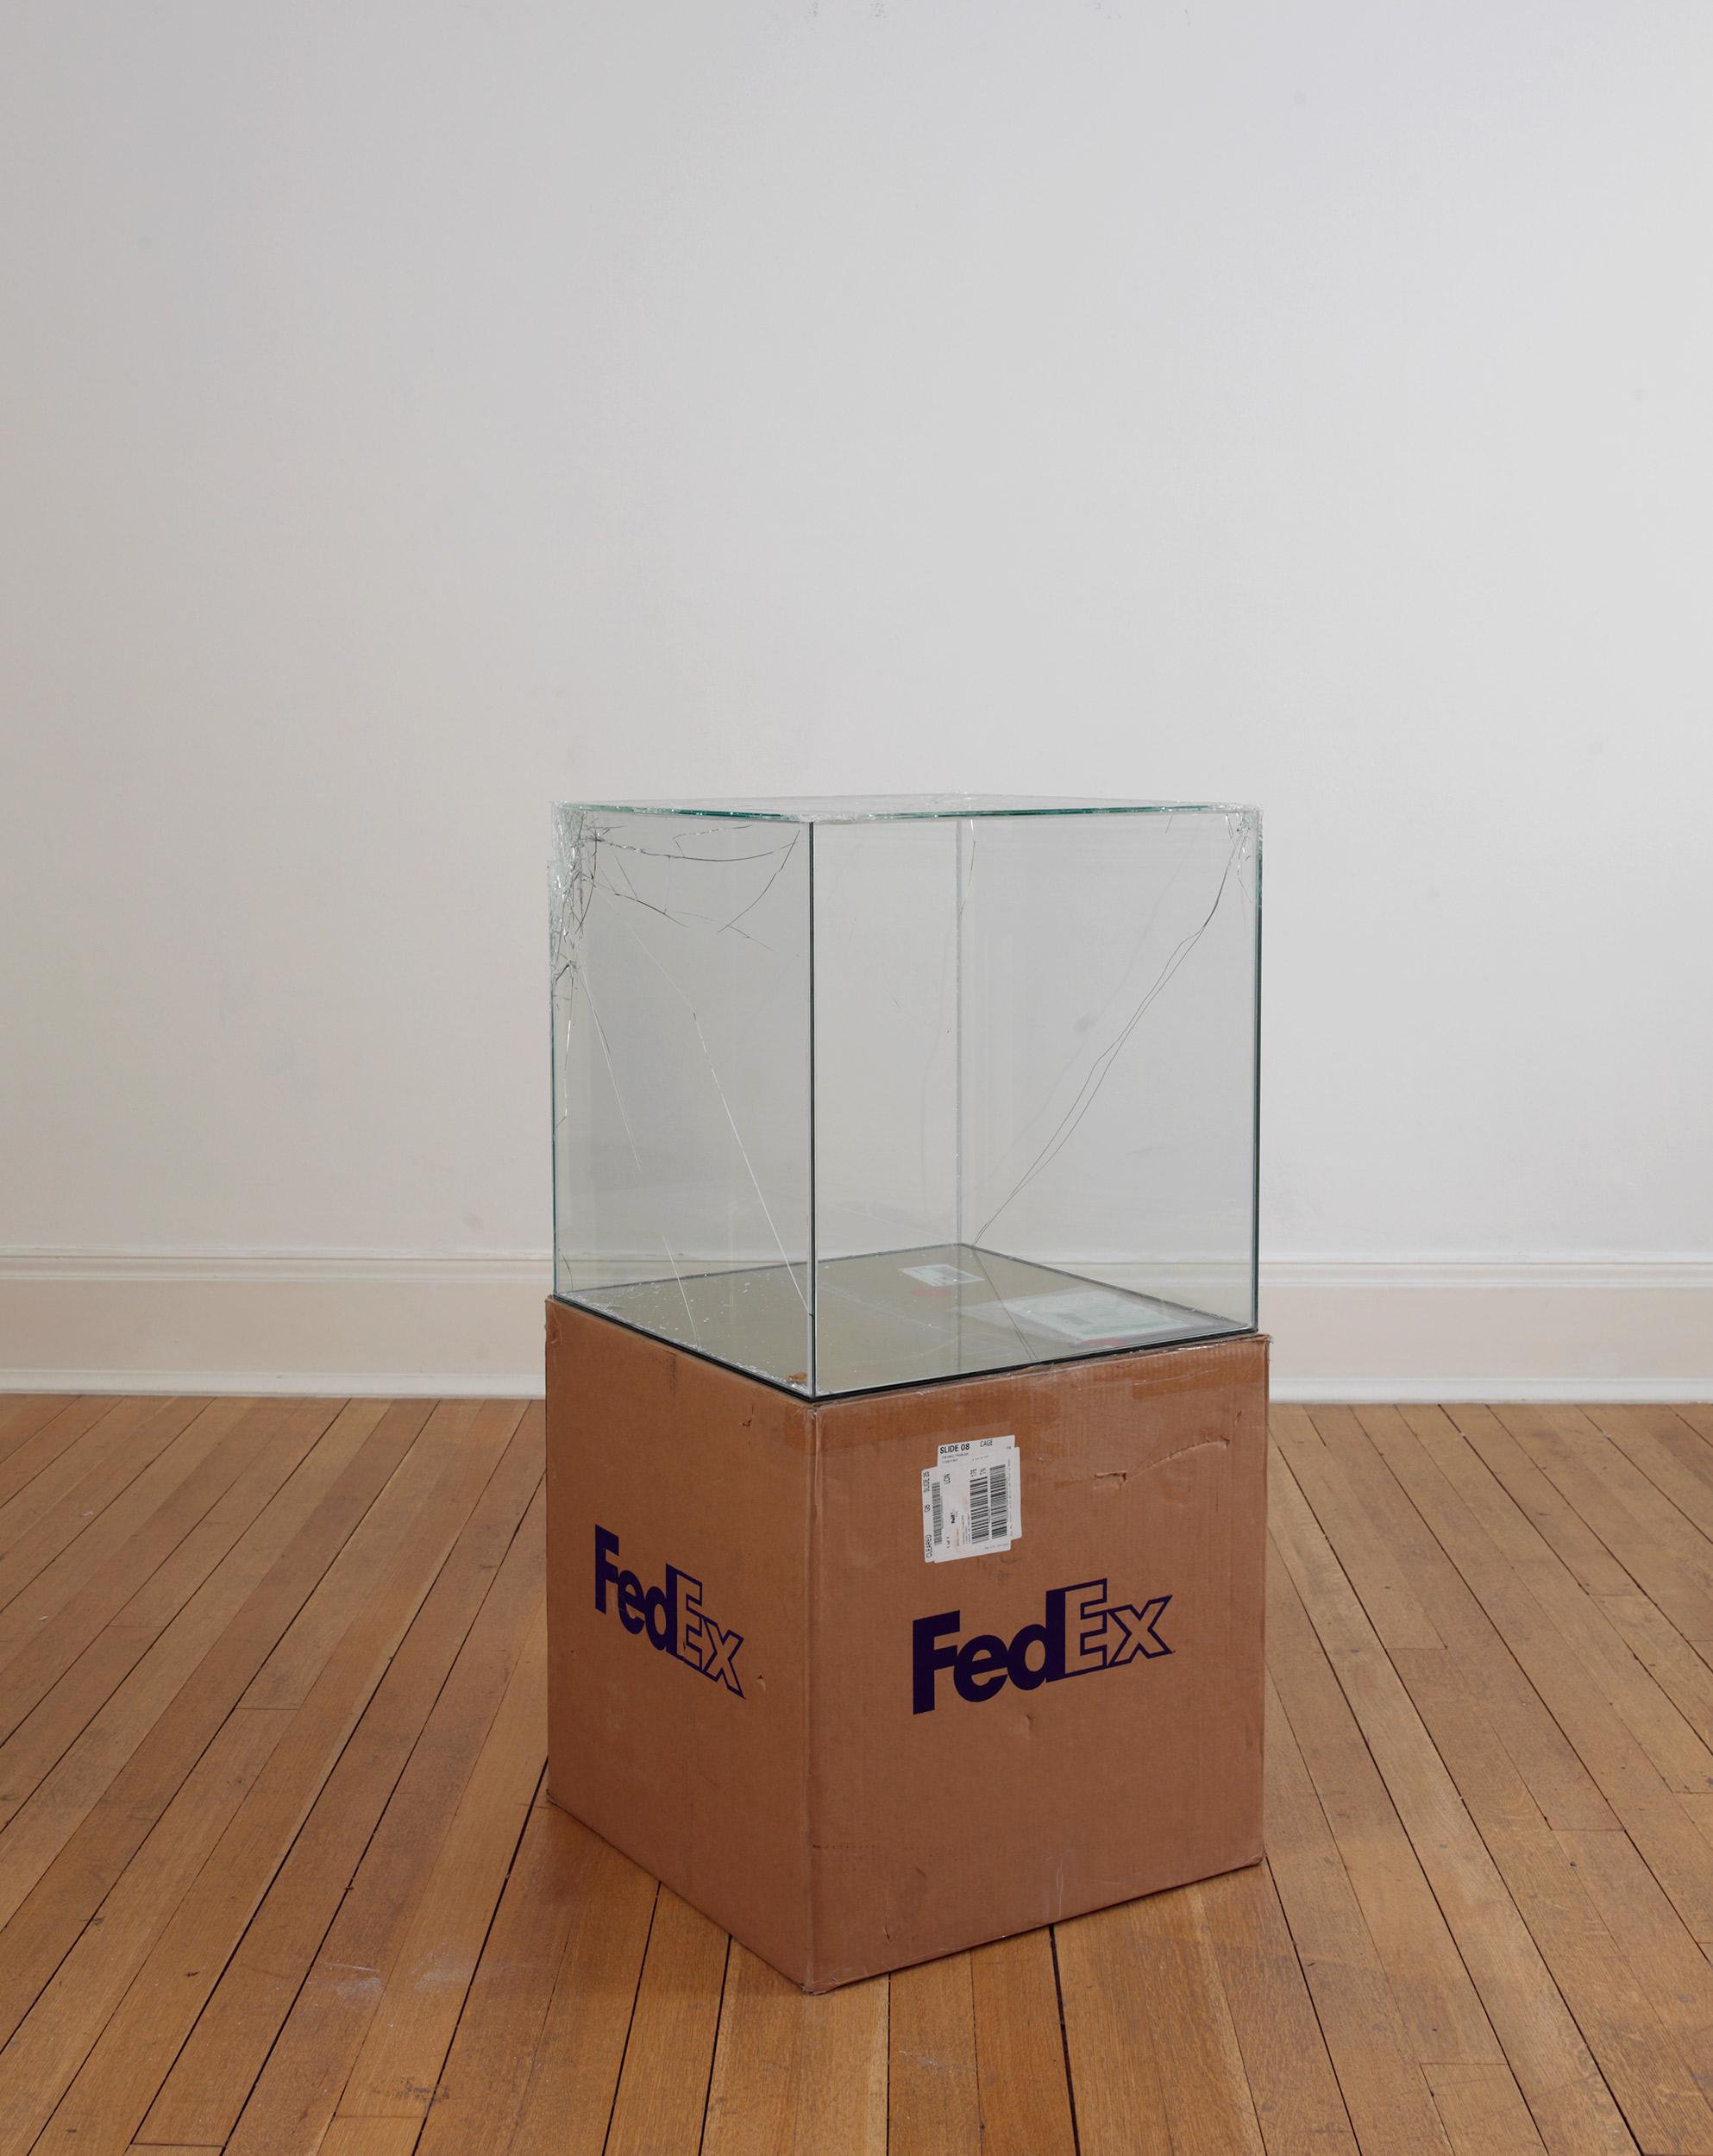 FedEx® Large Kraft Box  © 2008 FEDEX 330510 REV 6/08 GP, International Priority, Los Angeles–London trk#868587728050, October 02–05, 2009    2009–   Laminated glass, FedEx shipping box, accrued FedEx shipping and tracking labels, silicone, metal, tape  24 x 24 x 24 inches   FedEx Glass Works, 2007–